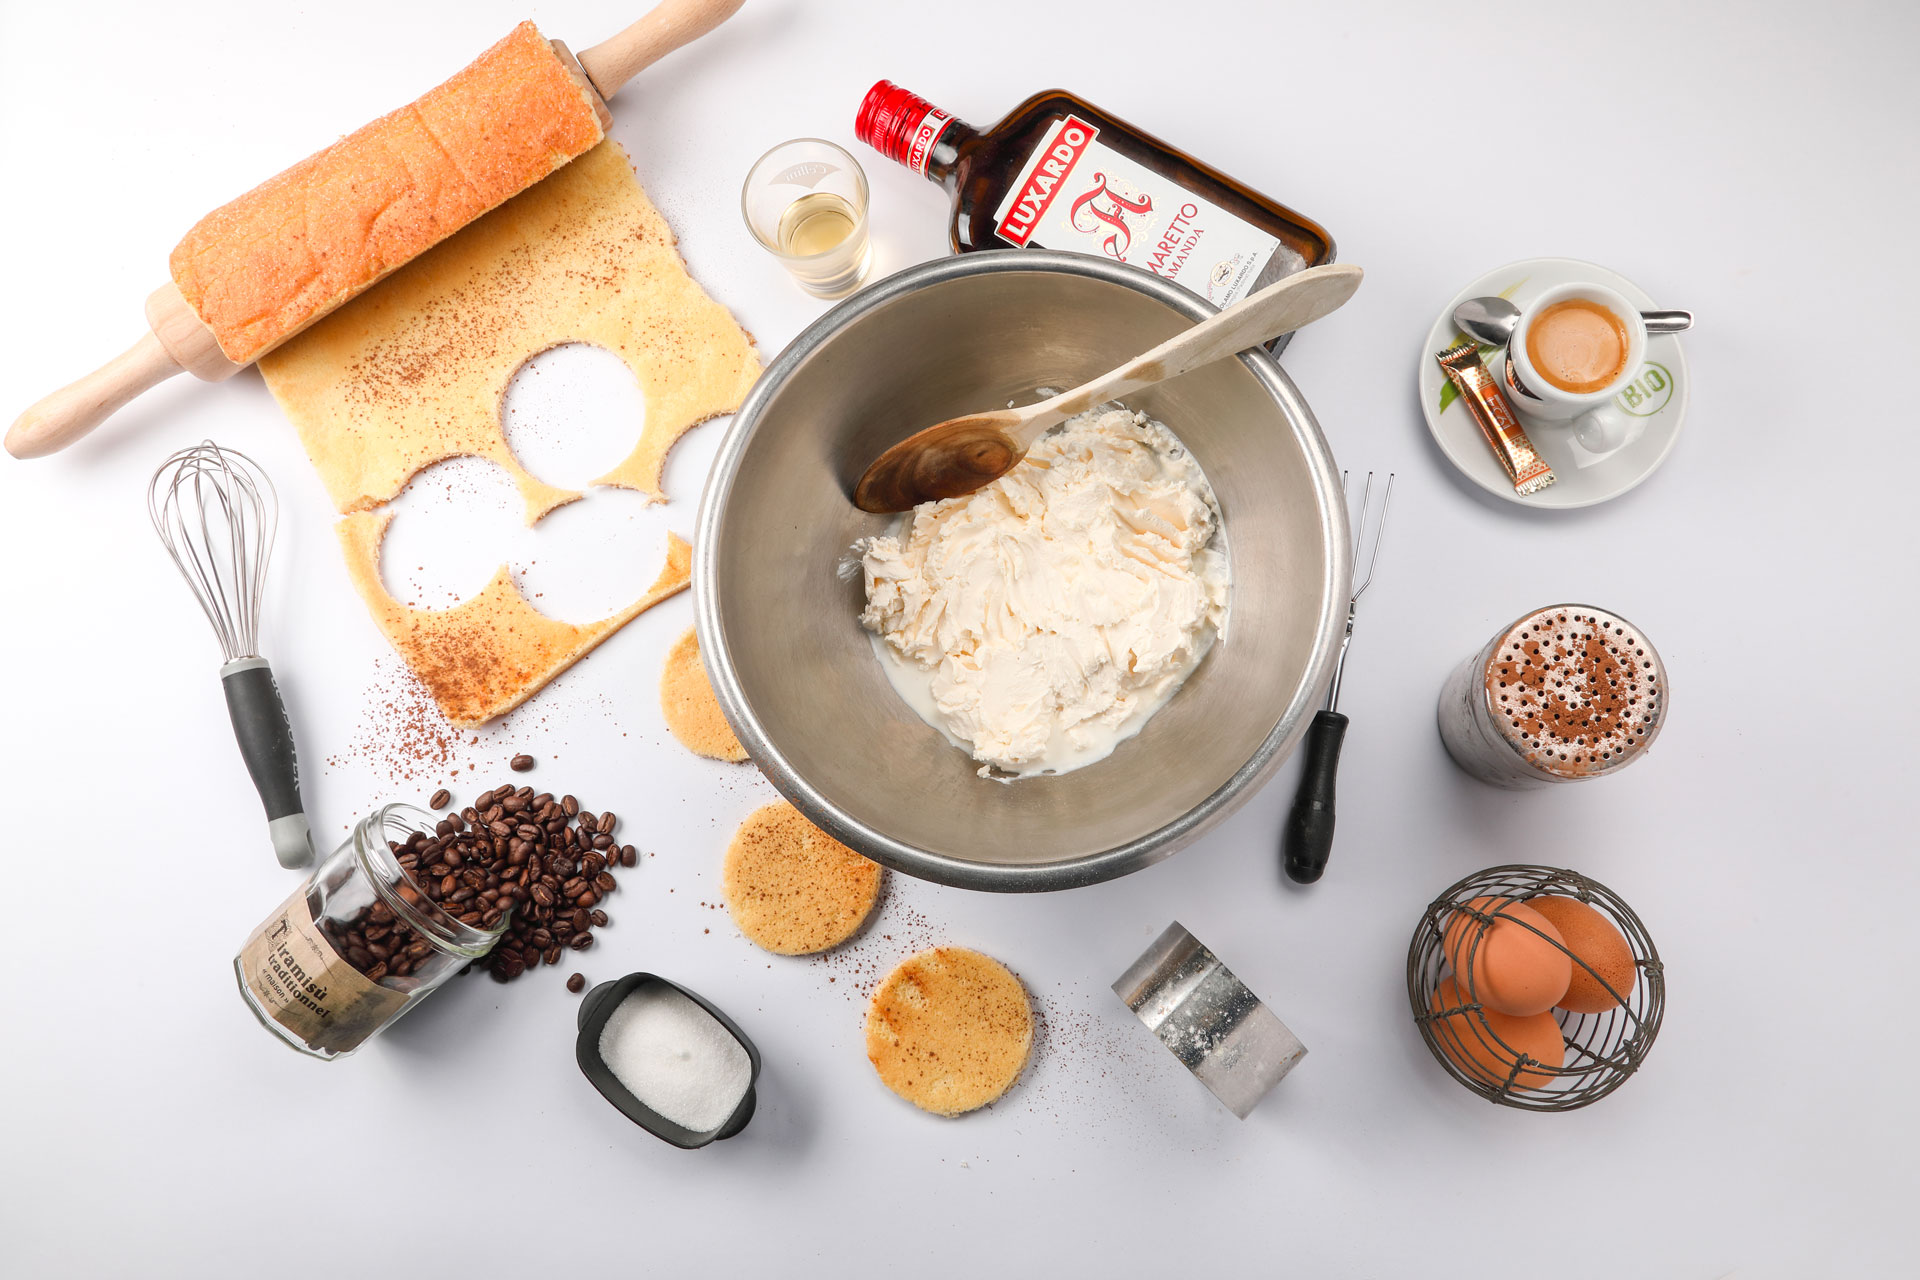 Ingrédients de la recette du tiramisu - La Scaleta